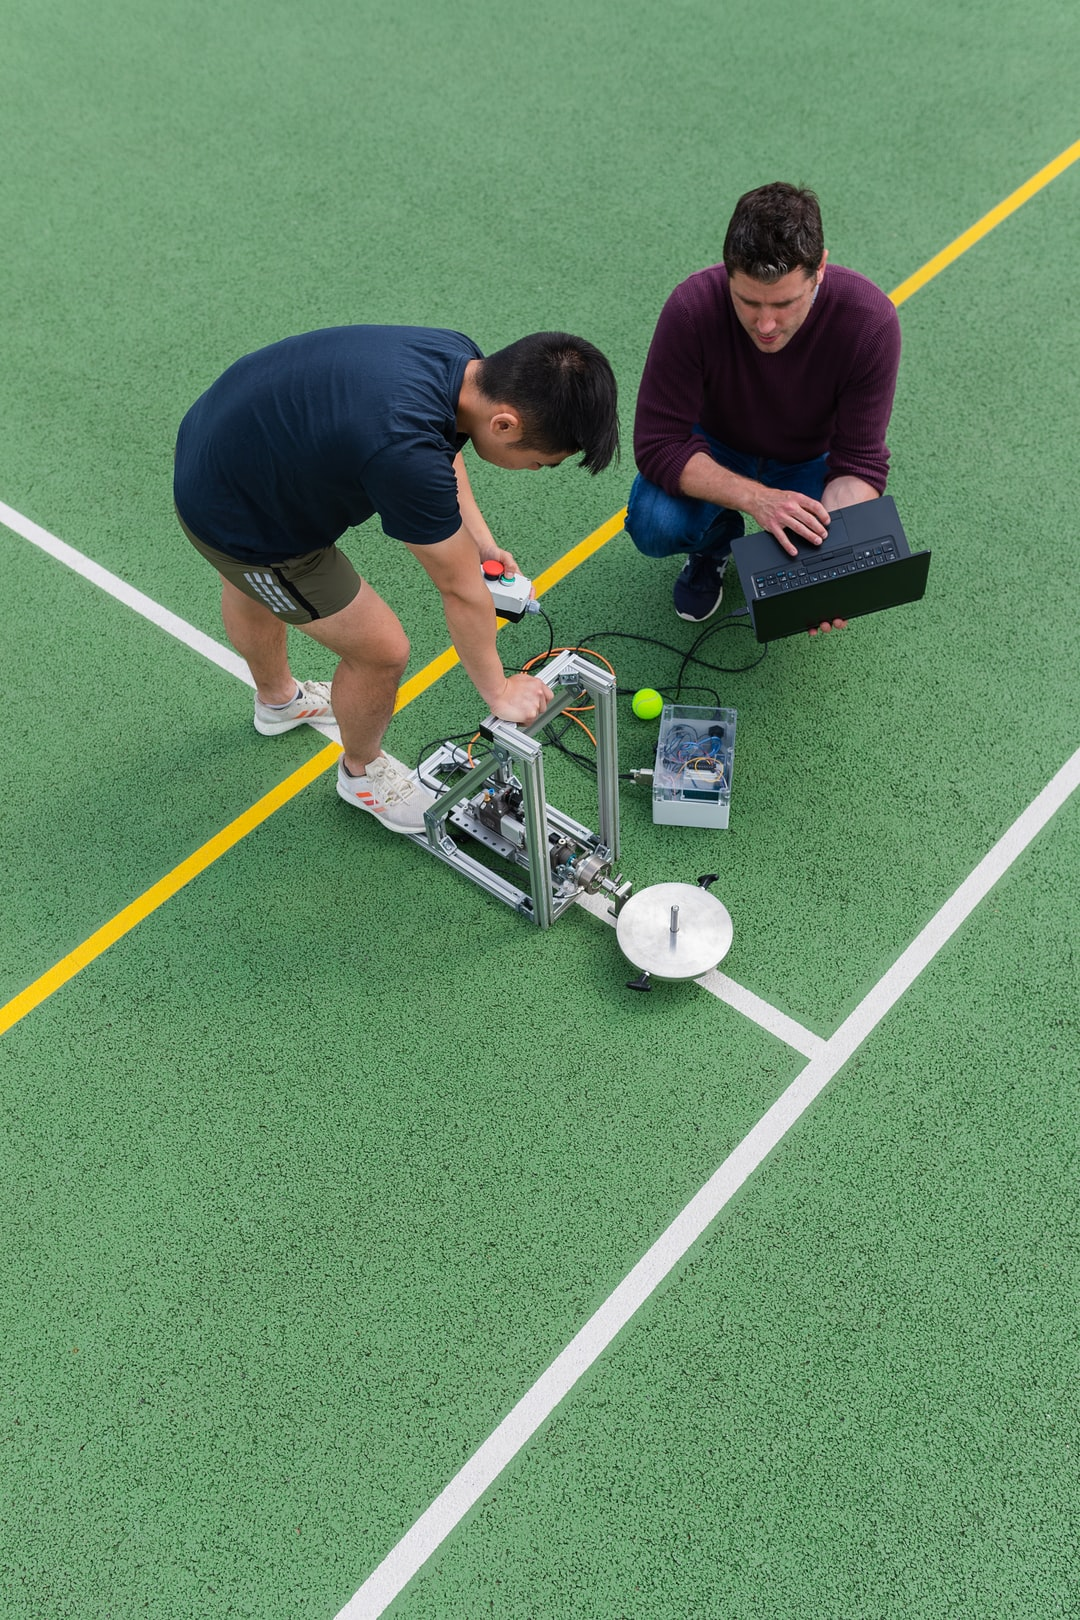 Sports engineers test tennis equipment